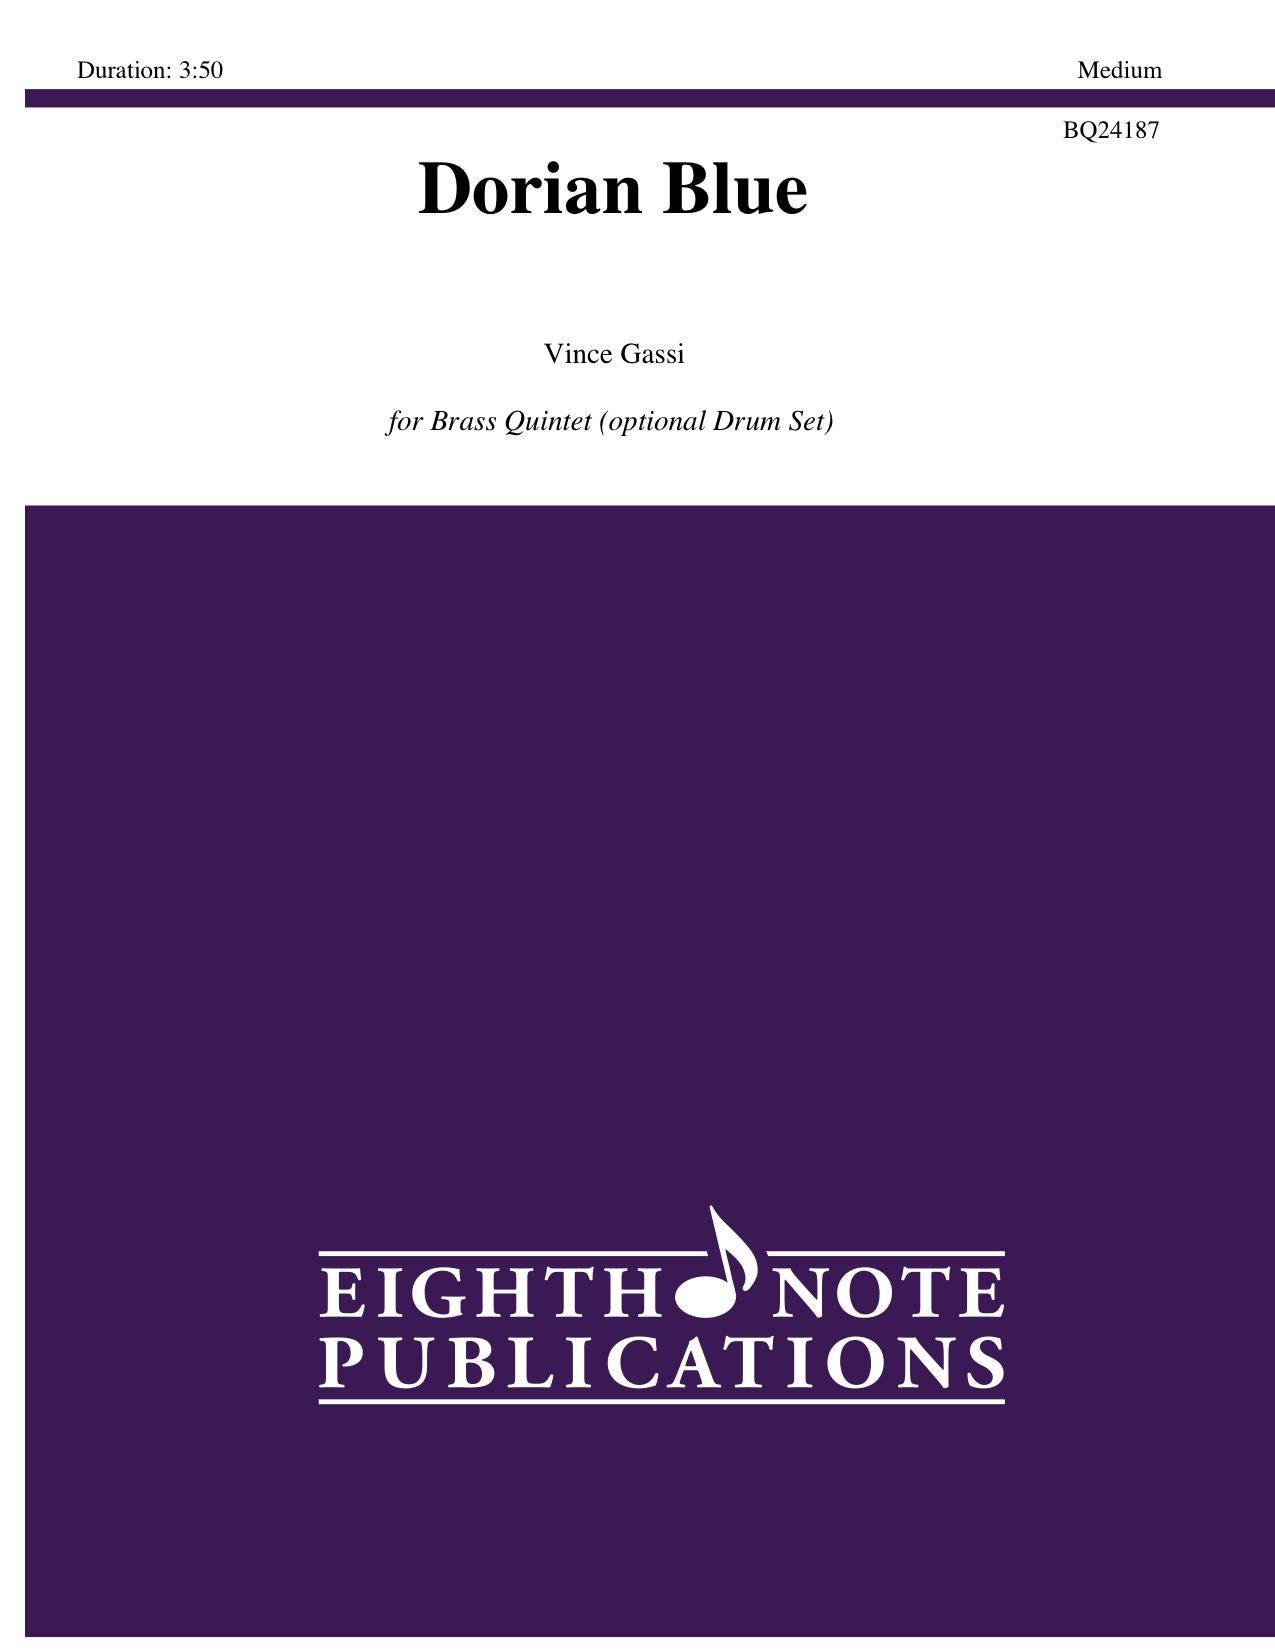 Dorian Blue - Vince Gassi